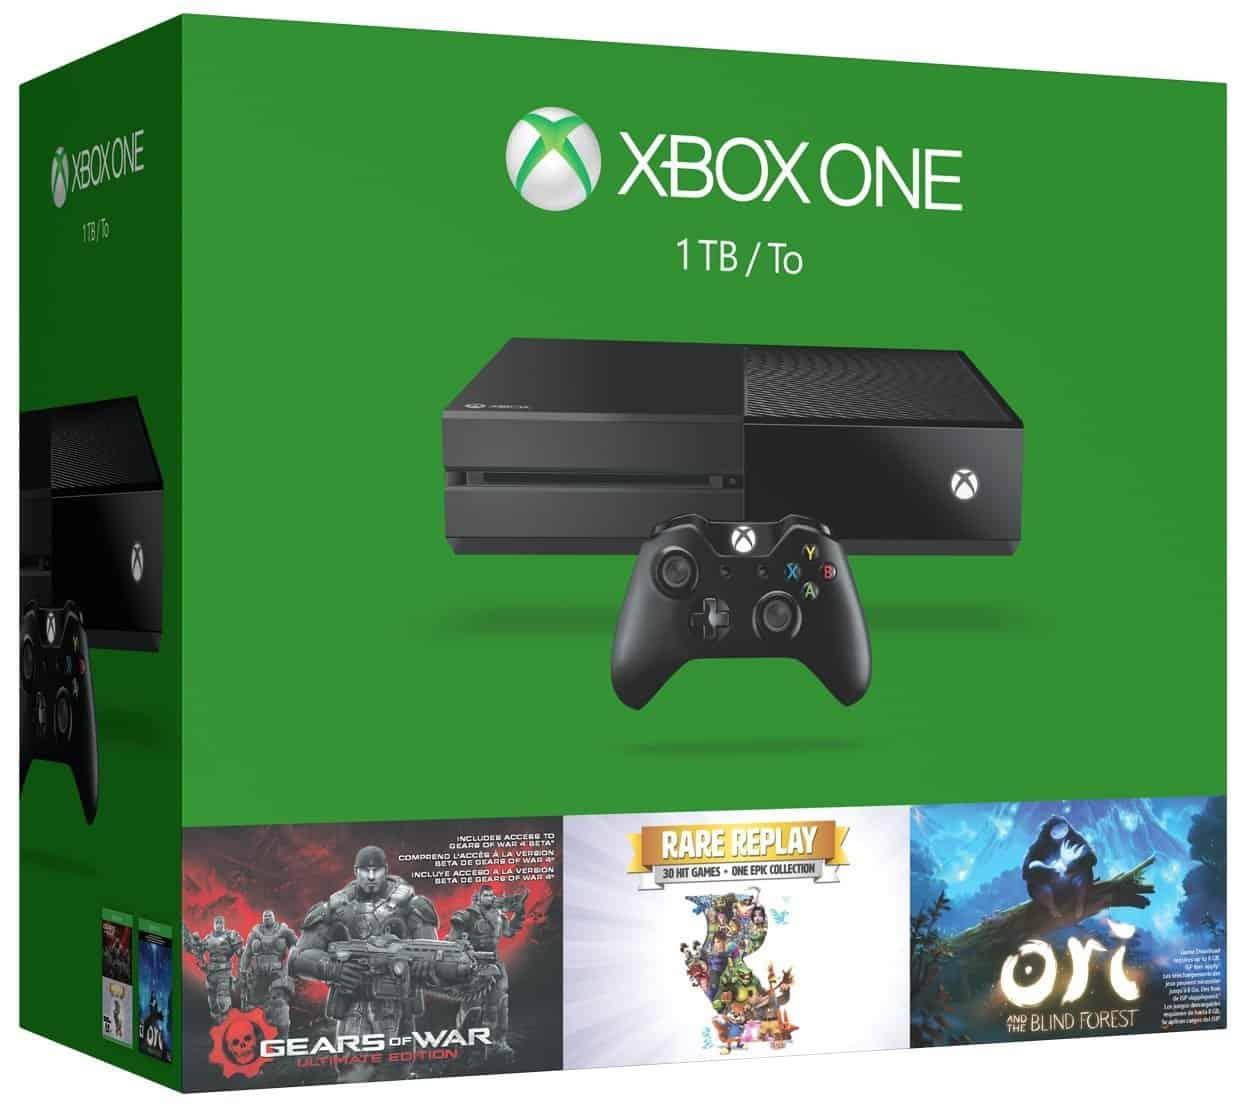 Xbox One 1TB 3-games bundle